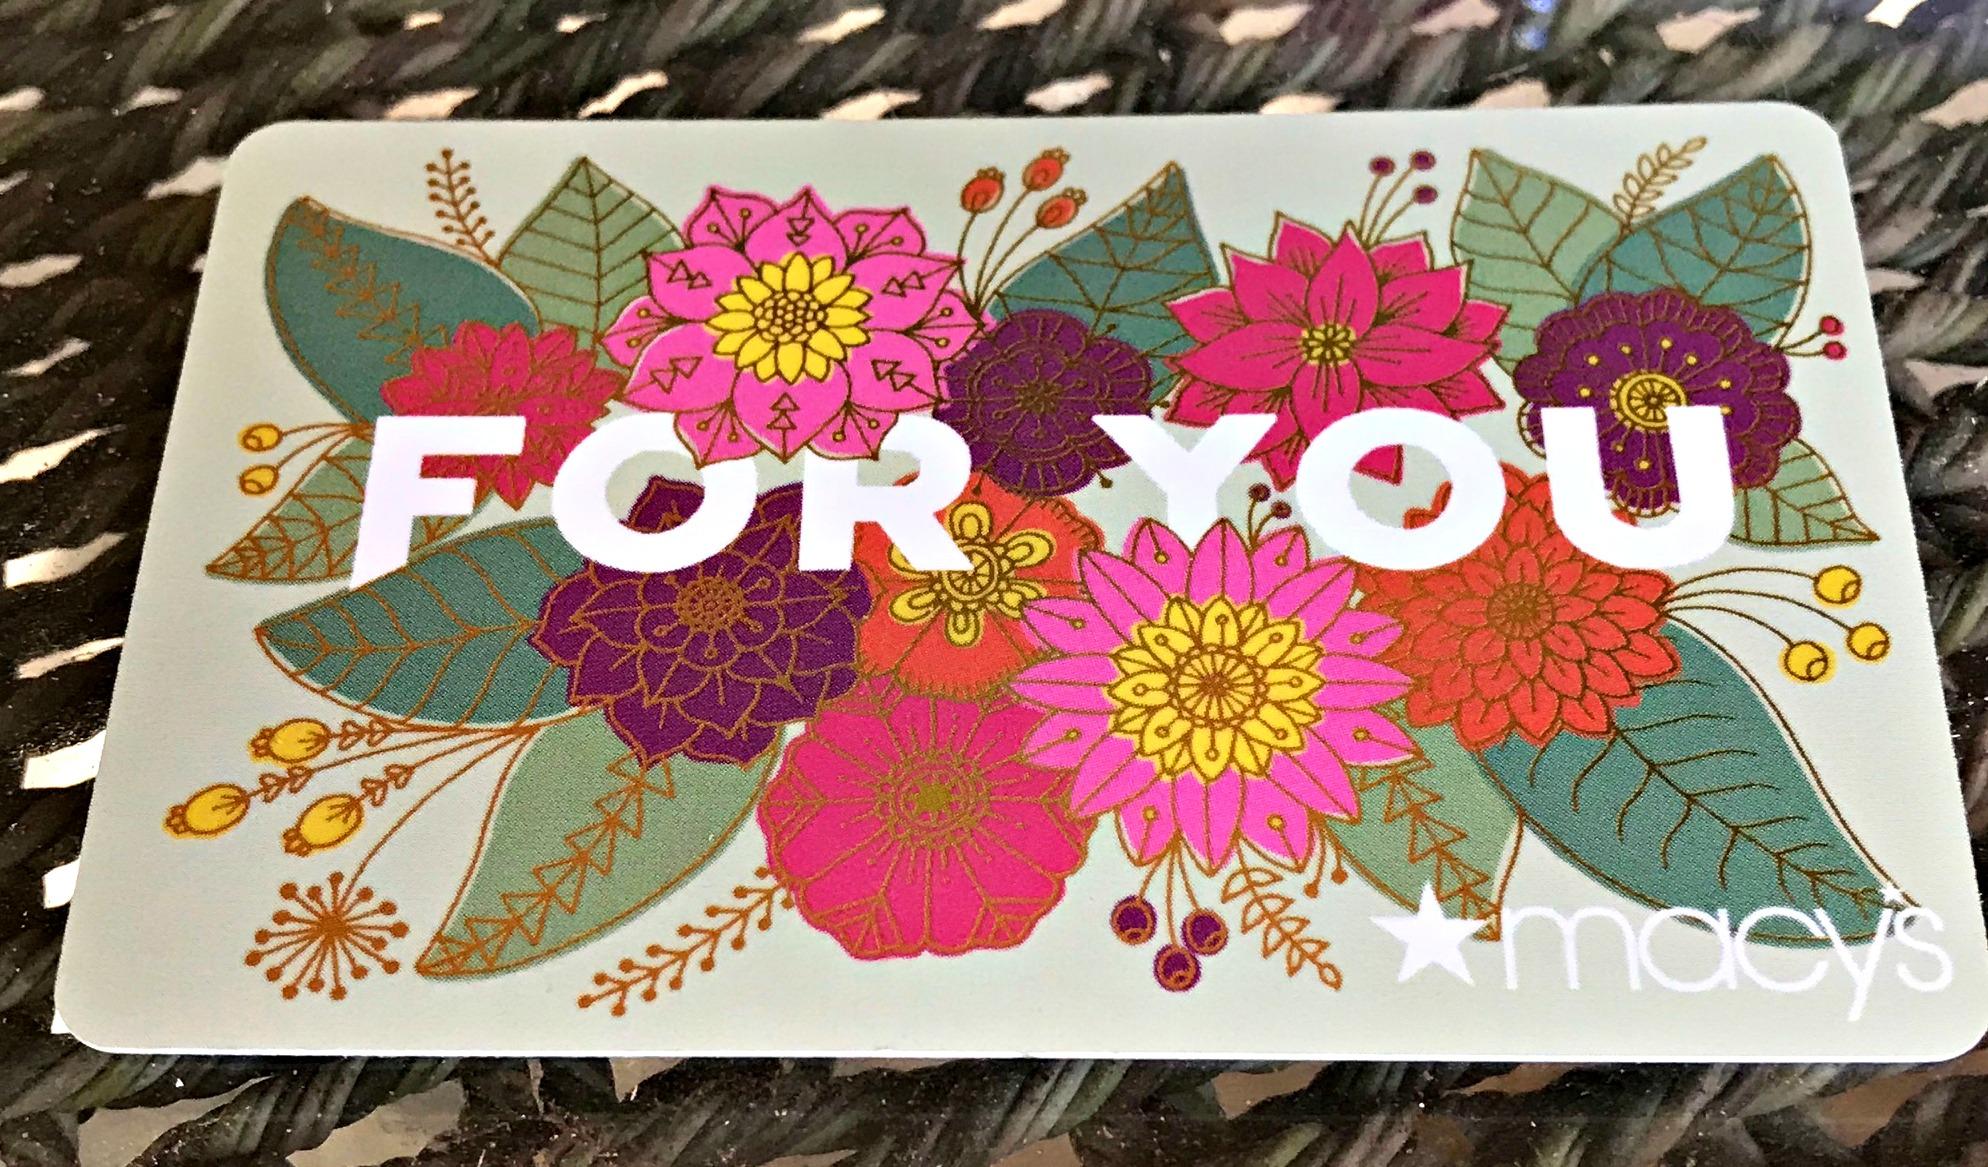 Macy's Gift Card - www.stampedwithaloha.com